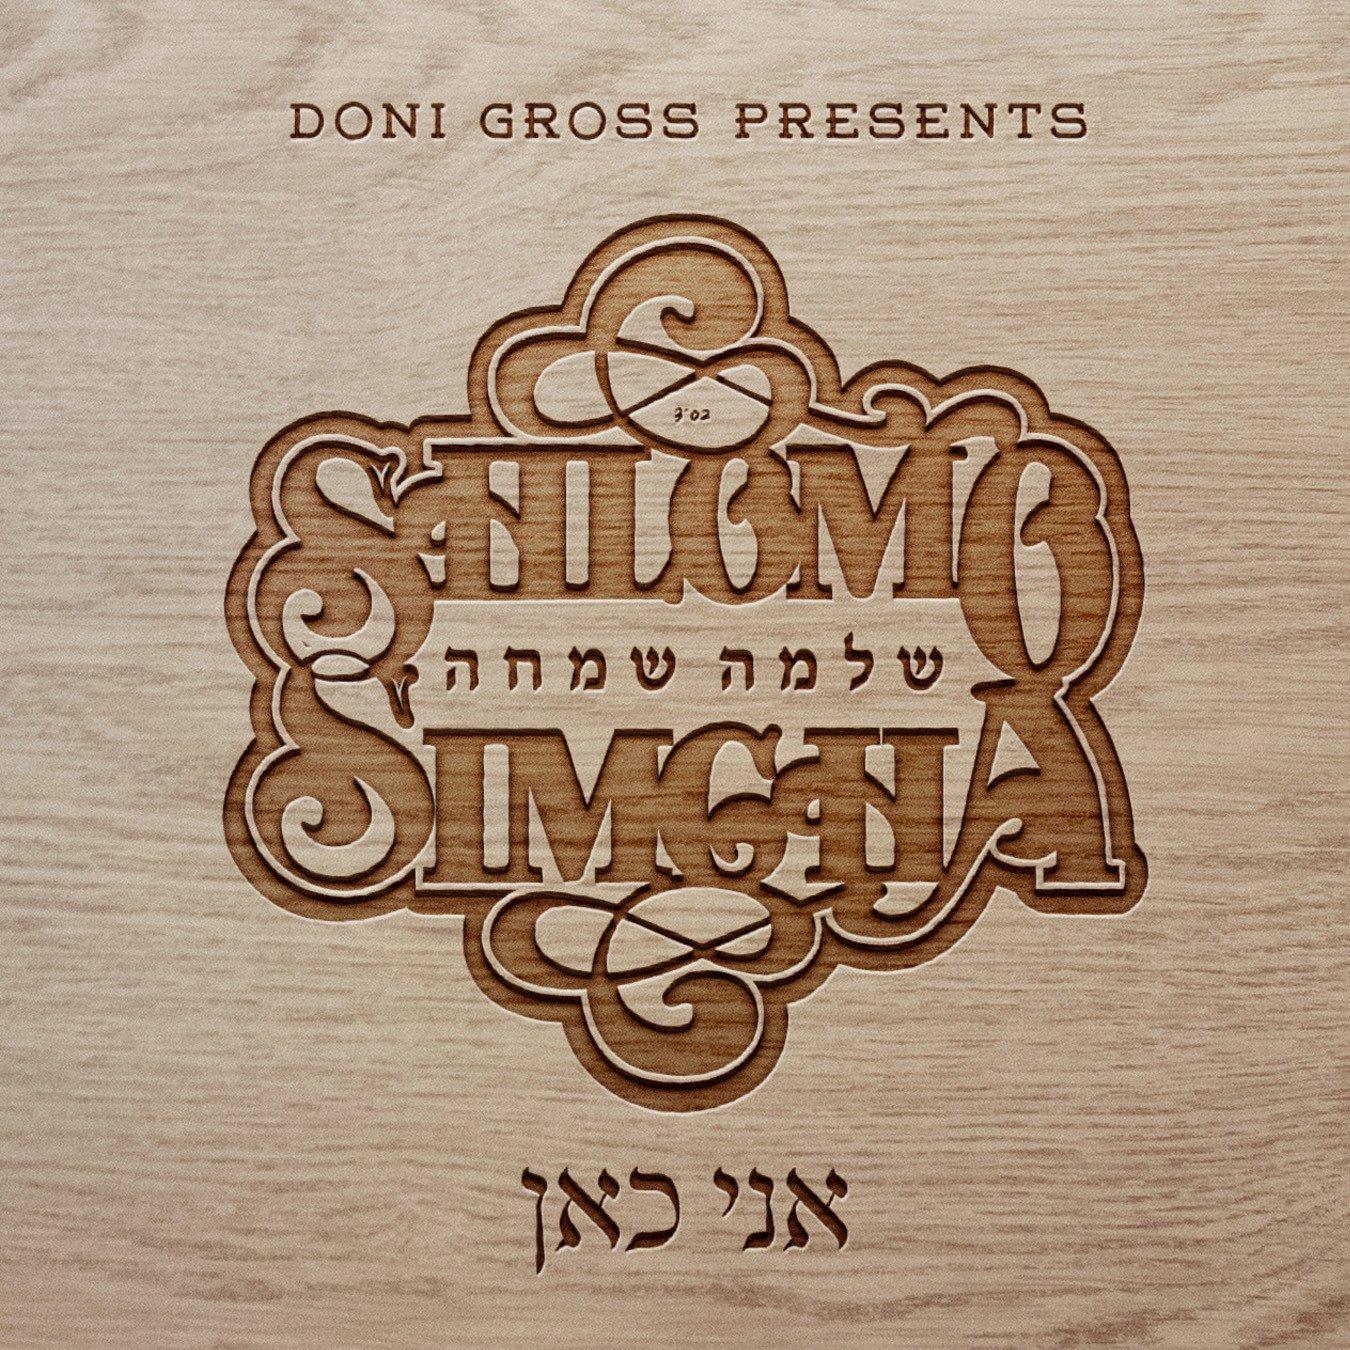 Shlomo Simcha Ani Kan Album Cover.jpeg